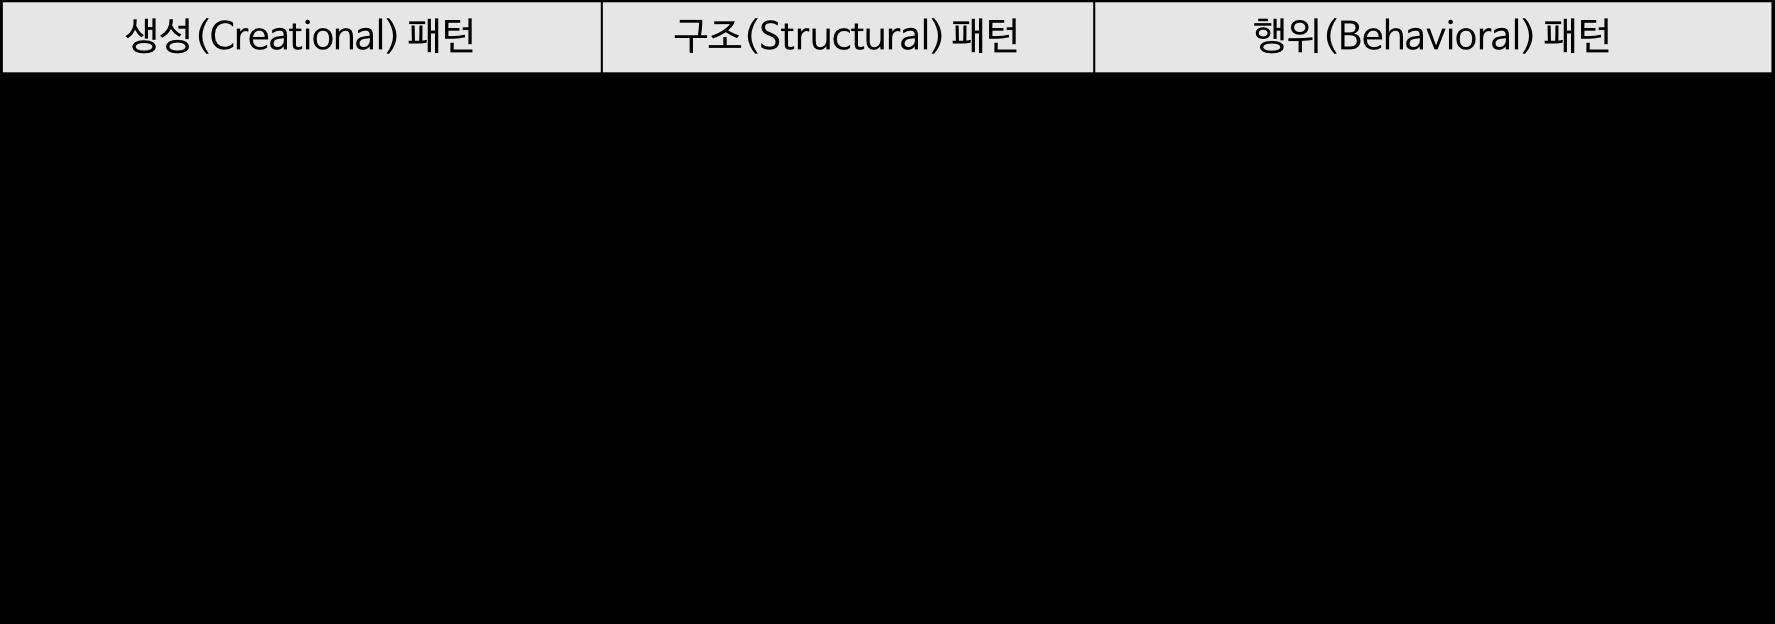 types-of-designpattern